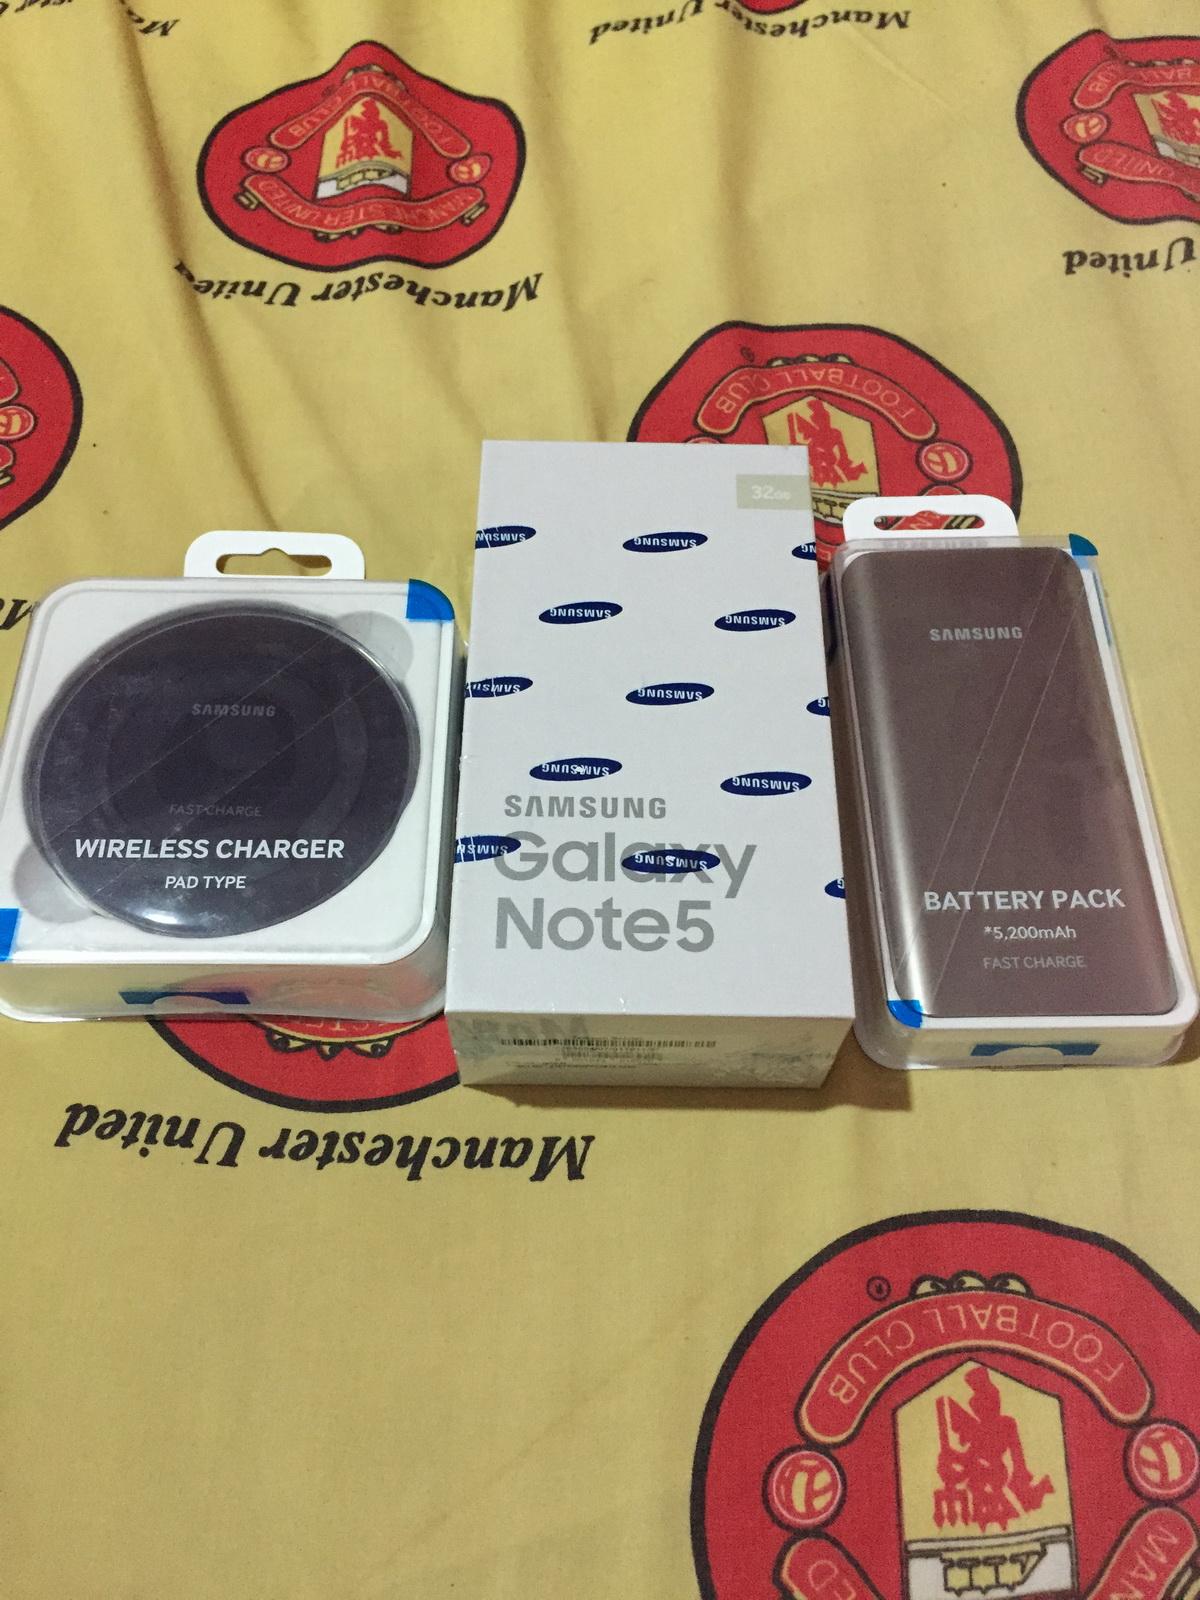 Samsung Galaxy Note 5 RESMI SEIN BONUS Wireless Charging &Battery Pack